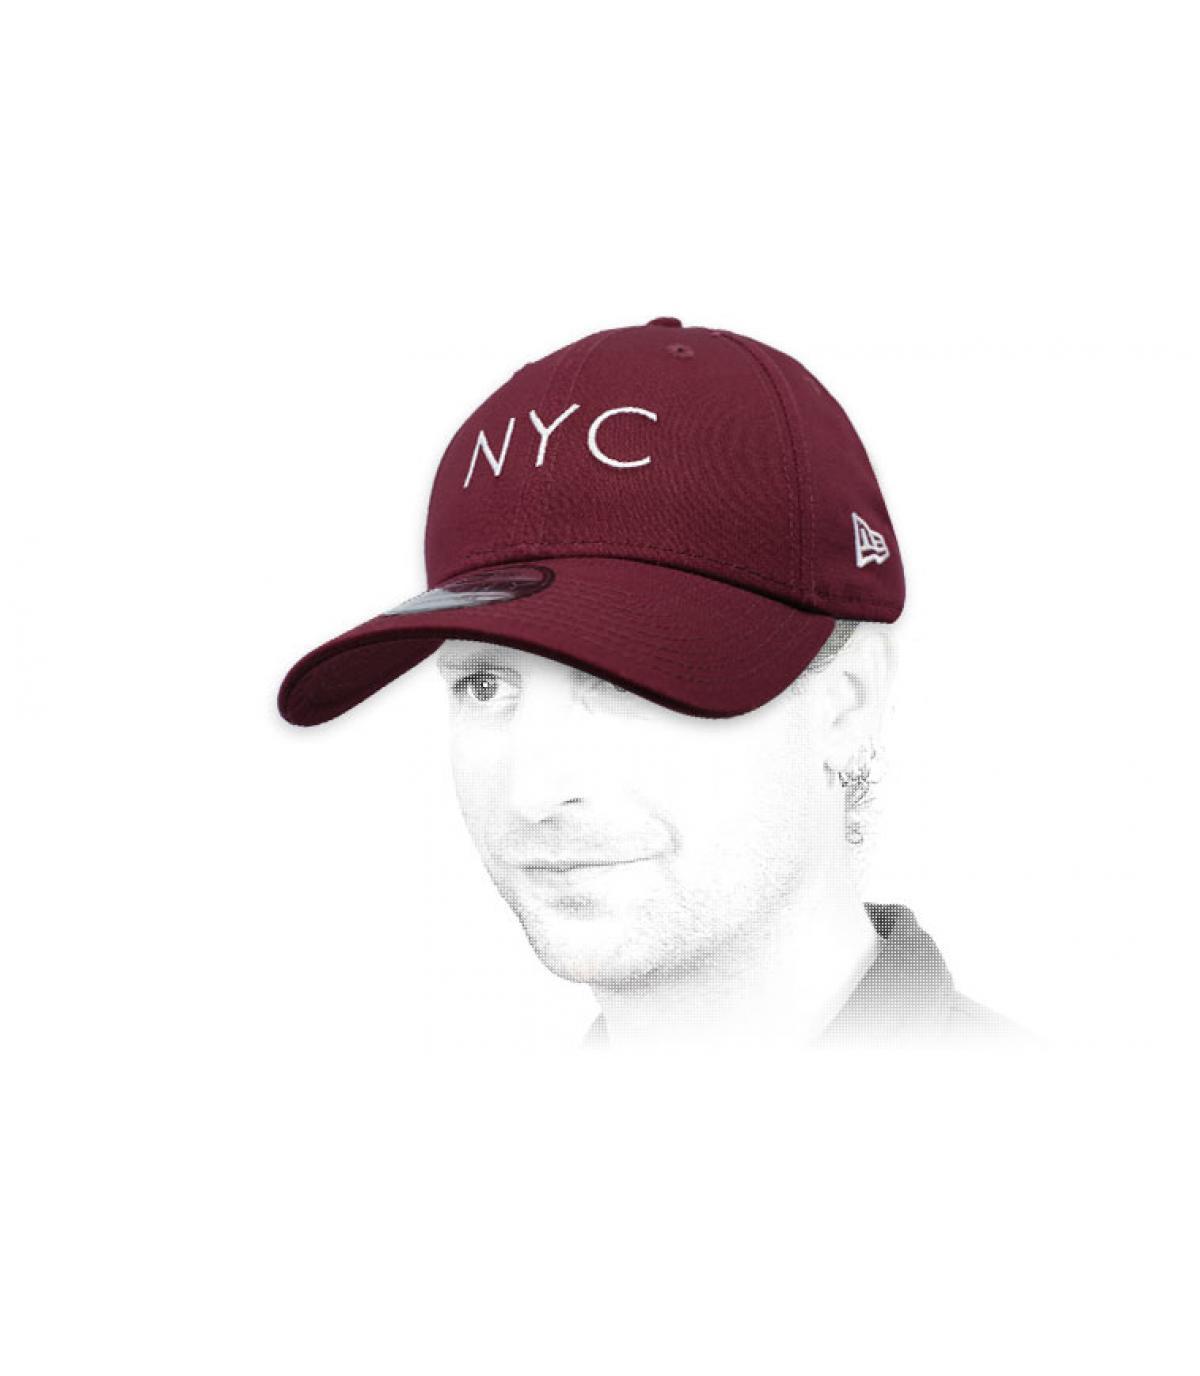 bordeaux NYC cap